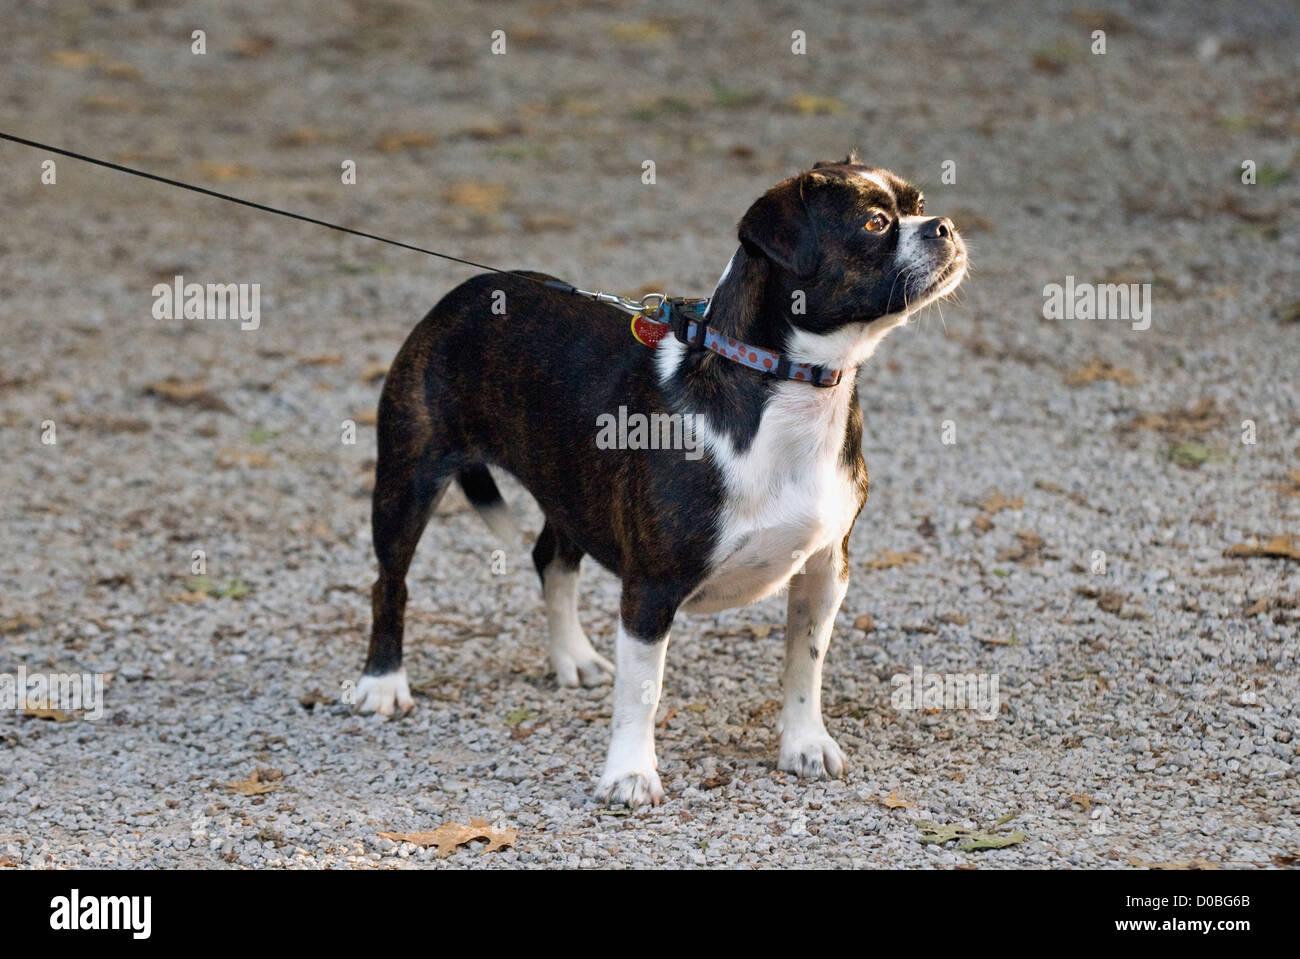 Boston Terrier Beagle Mixed Breed Dog on Adjustable Leash - Stock Image